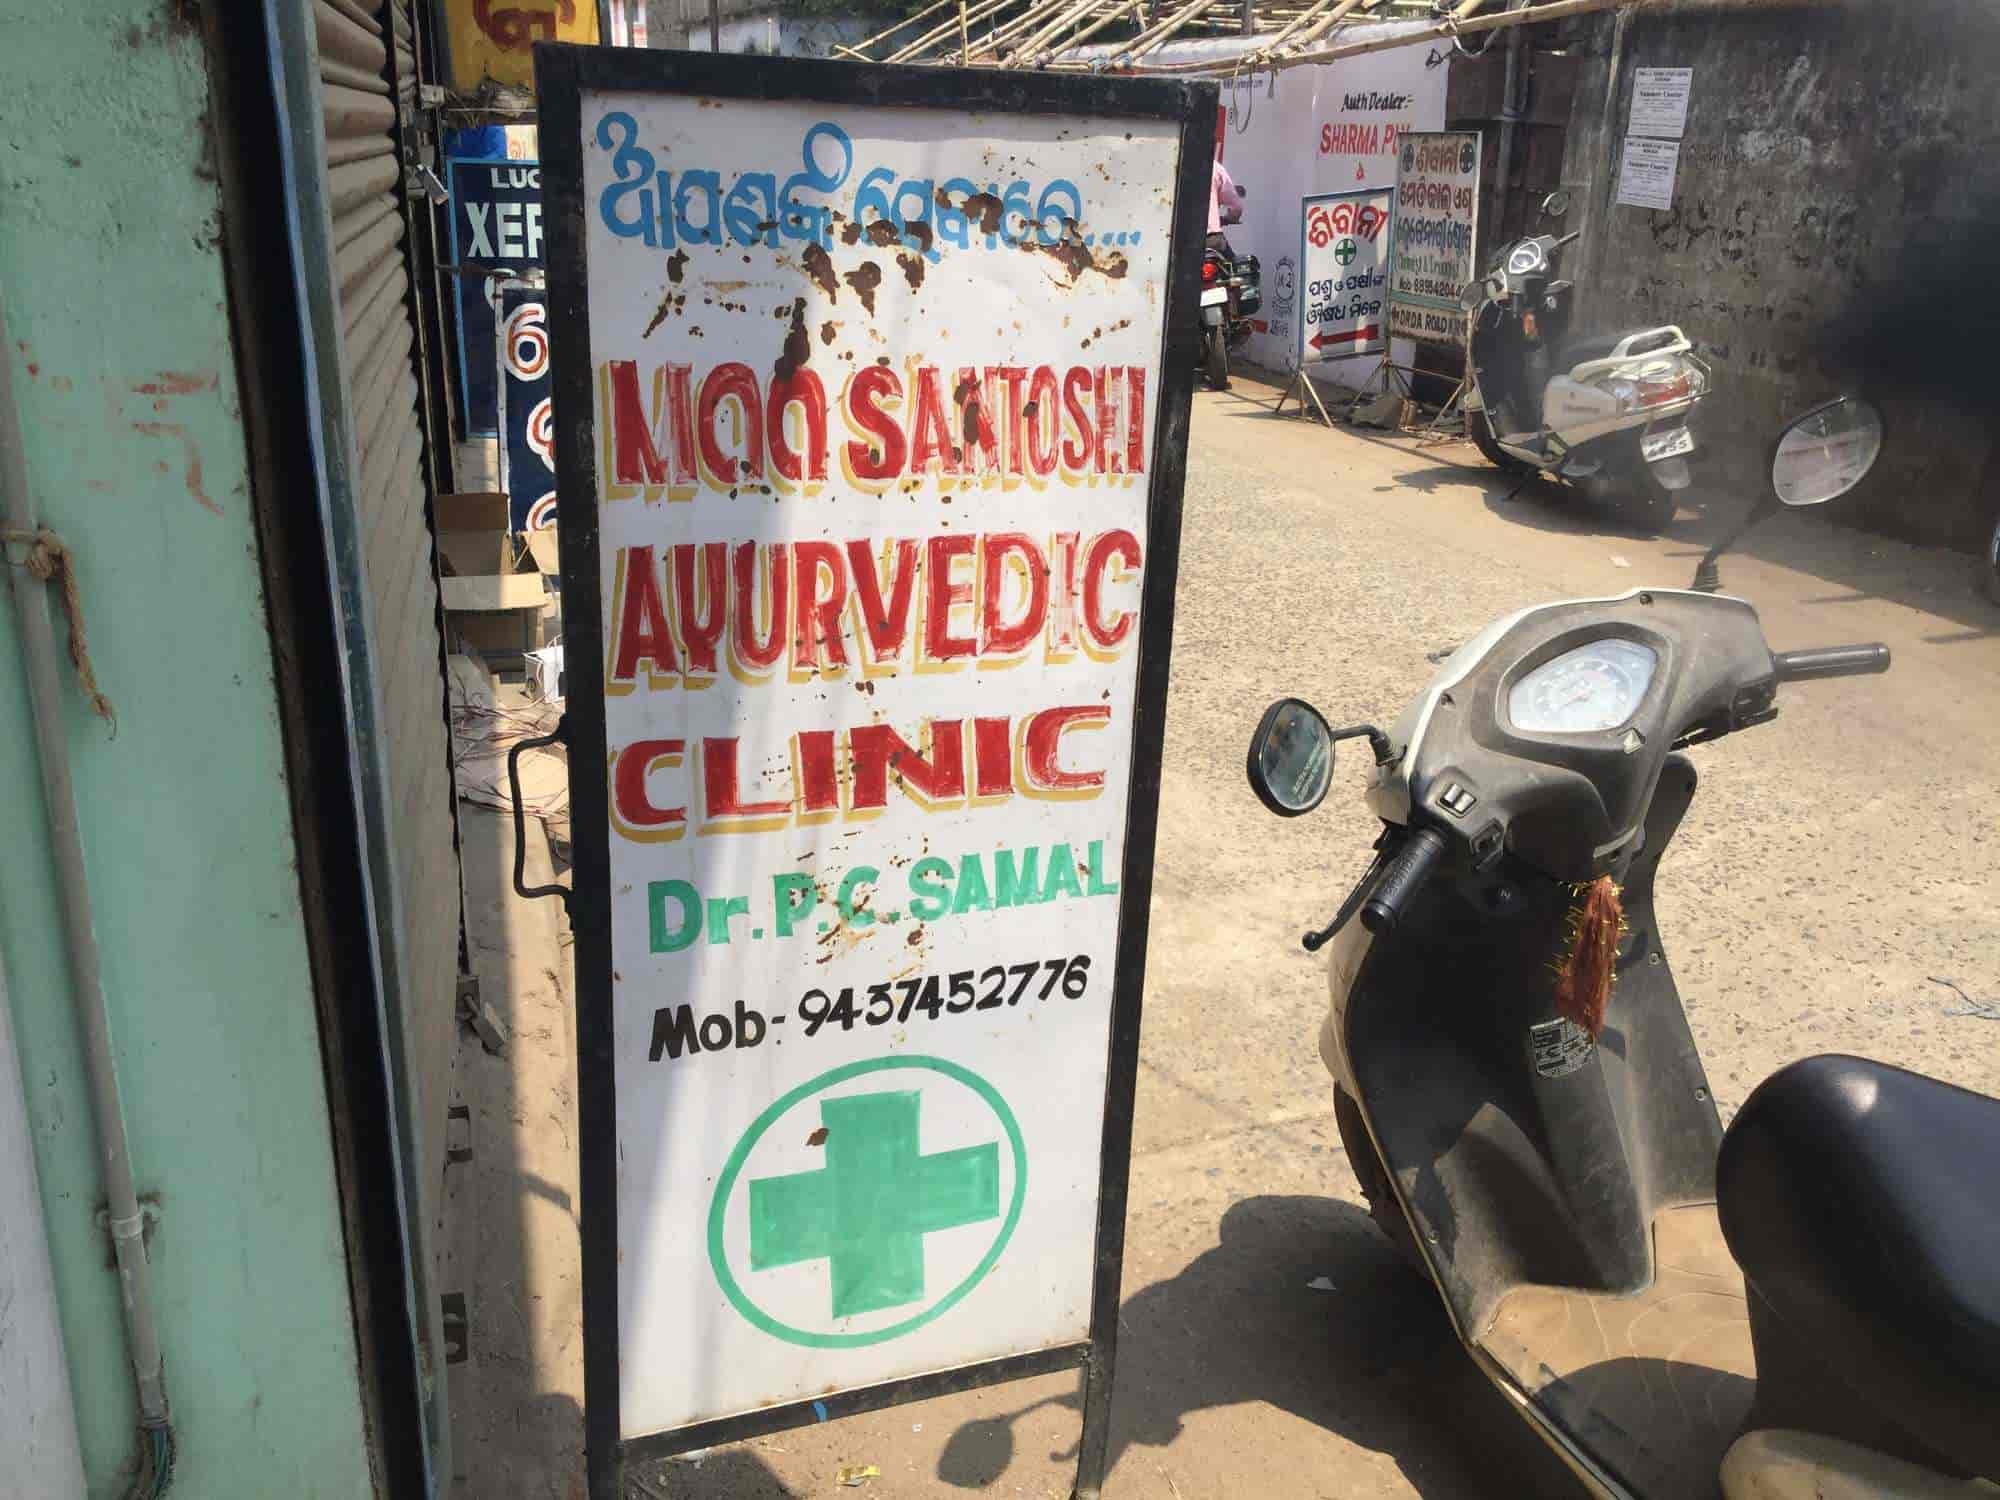 Maa Santoshi Ayurvedic Clinic - Ayurvedic Doctors - Book